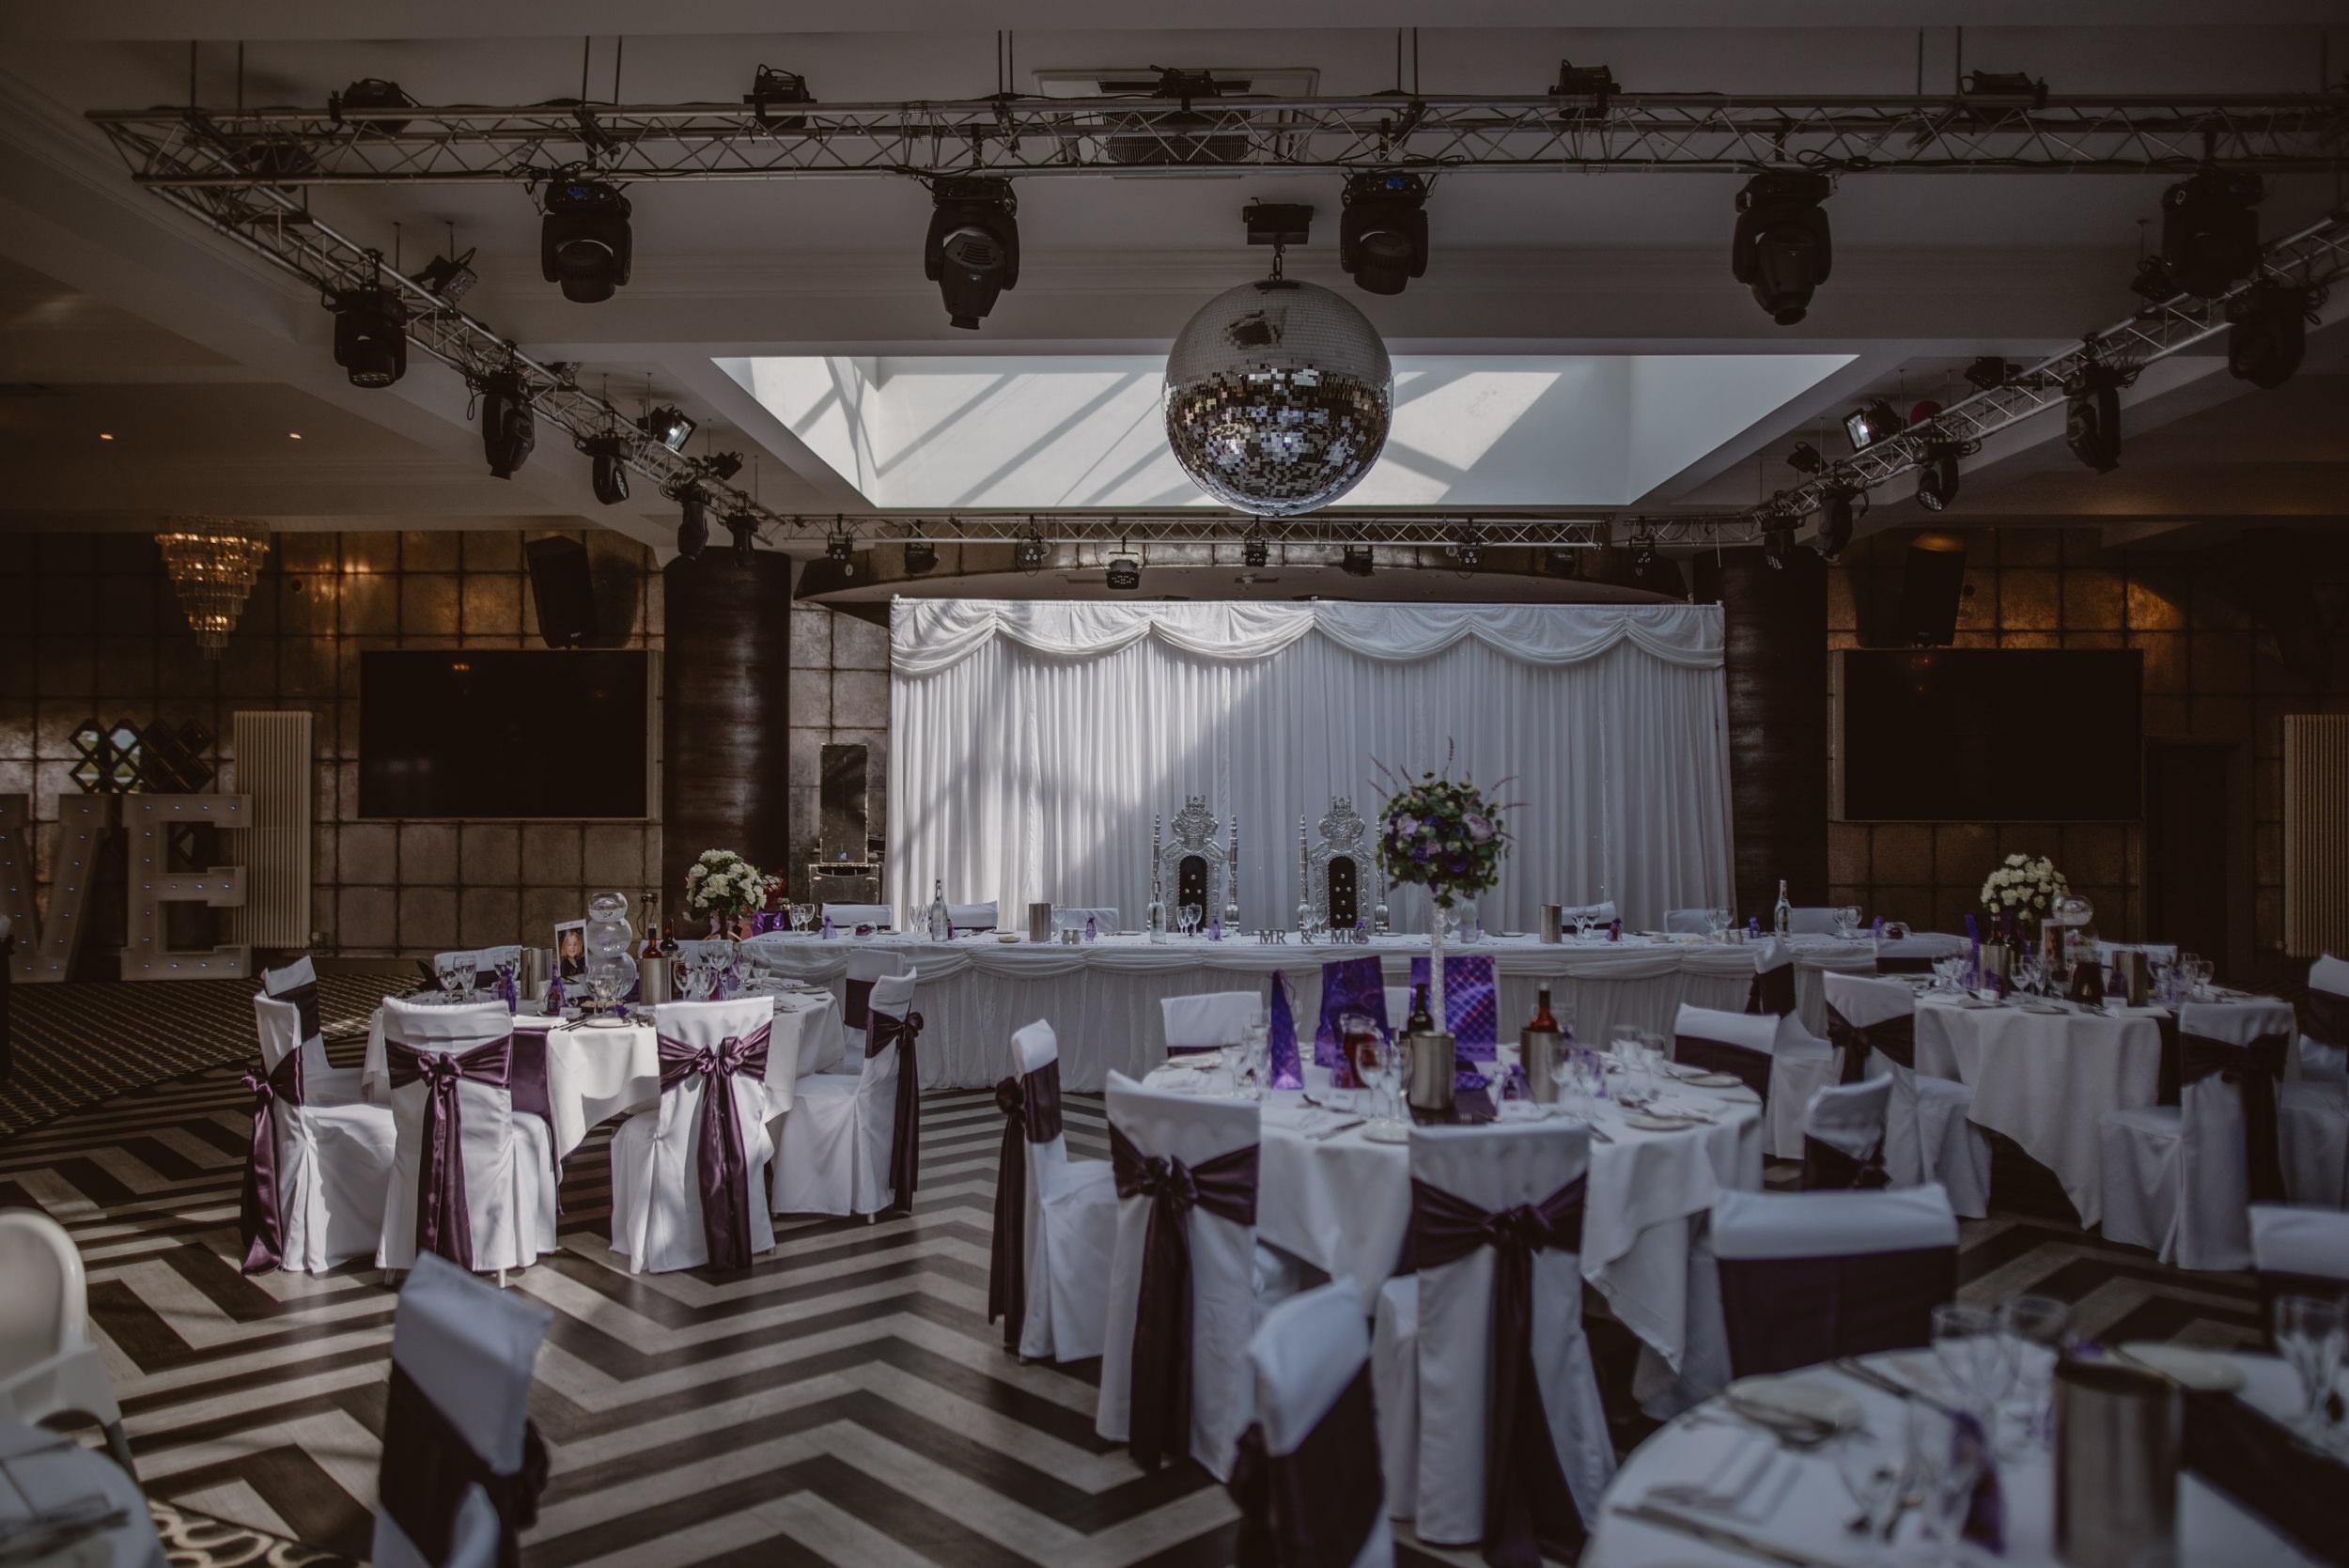 Chantelle-and-Stephen-Old-Thorns-Hotel-Wedding-Liphook-Manu-Mendoza-Wedding-Photography-330.jpg